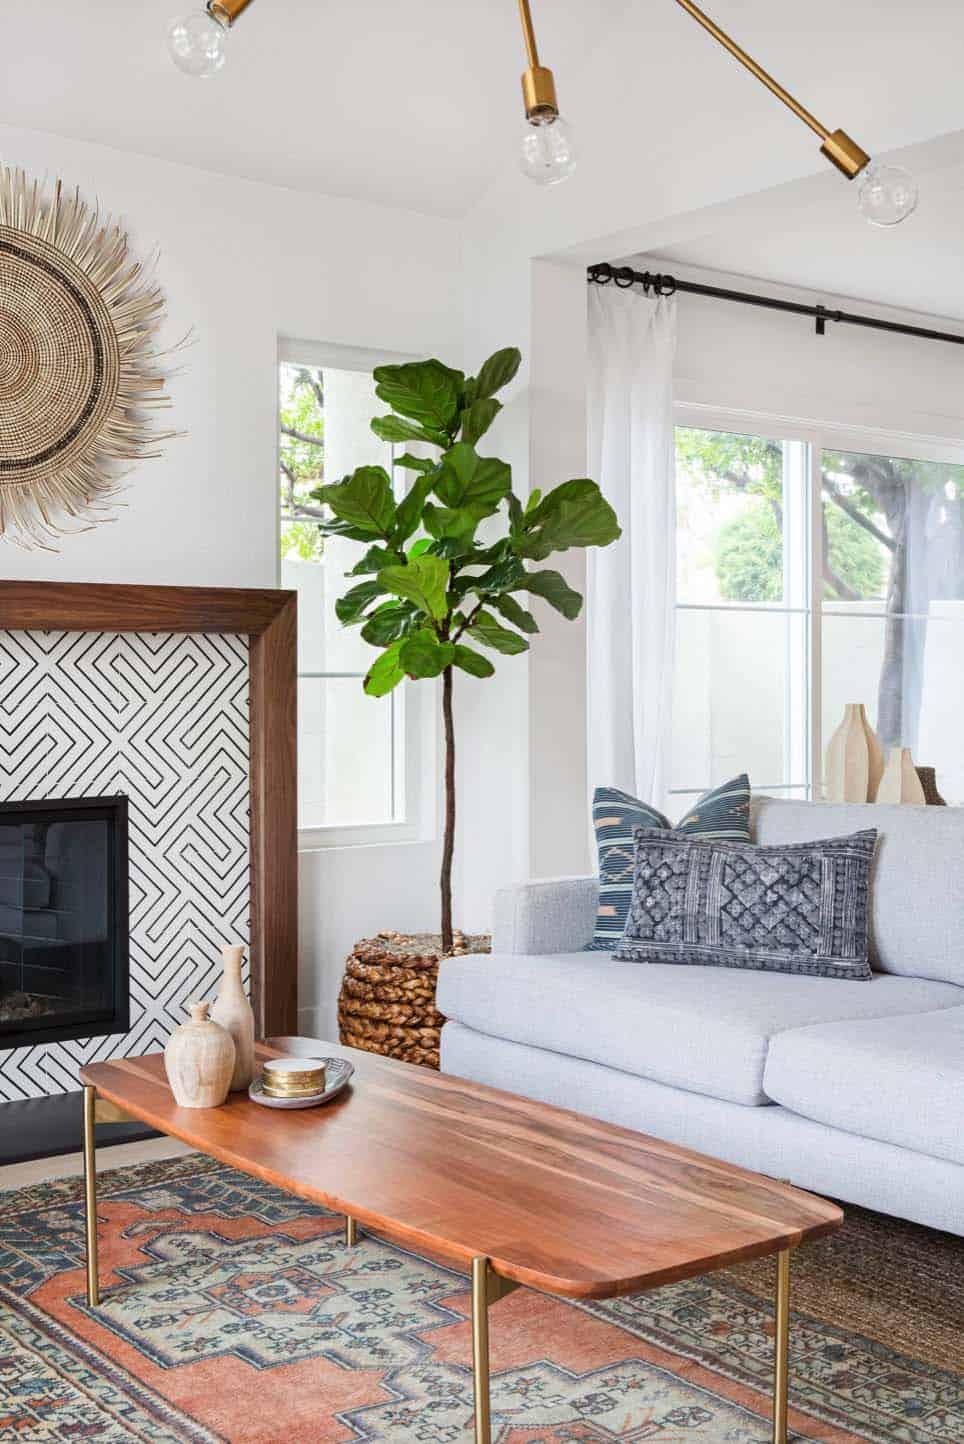 California Eclectic Home-Lindye Galloway Interiors-02-1 Kindesign